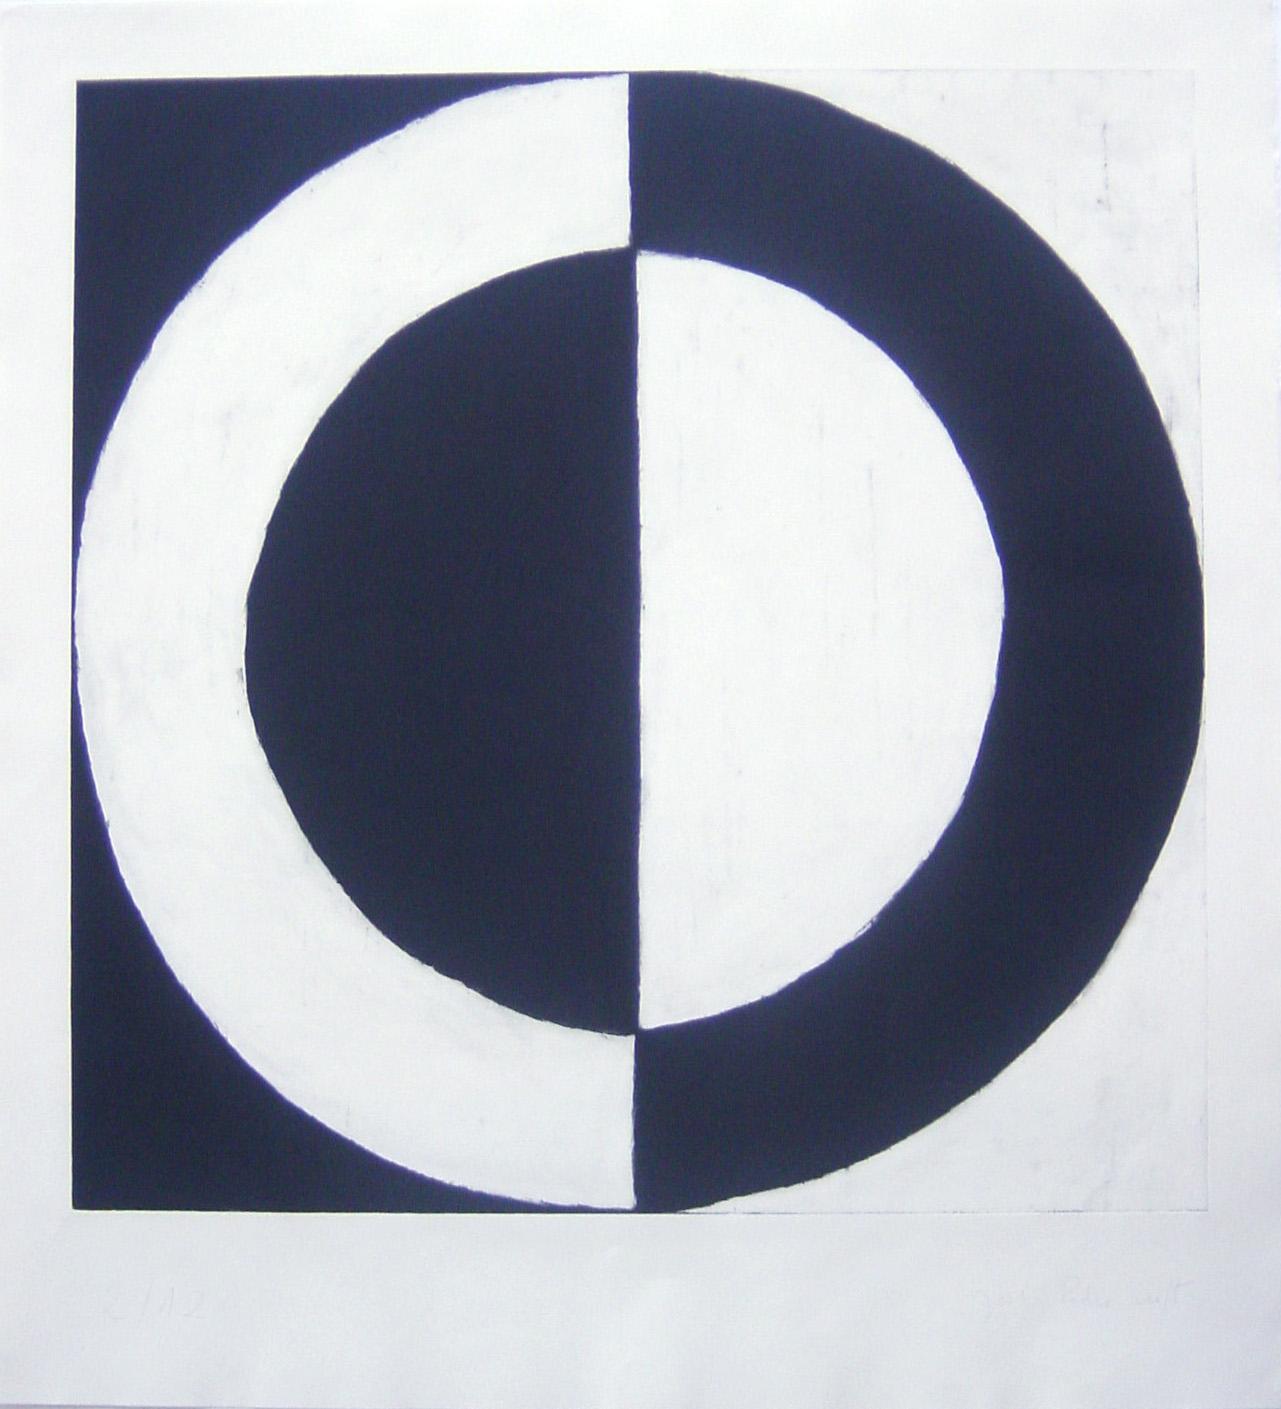 Untitled, (ed.12), 1997, etching, 124 x 112,5 cm.